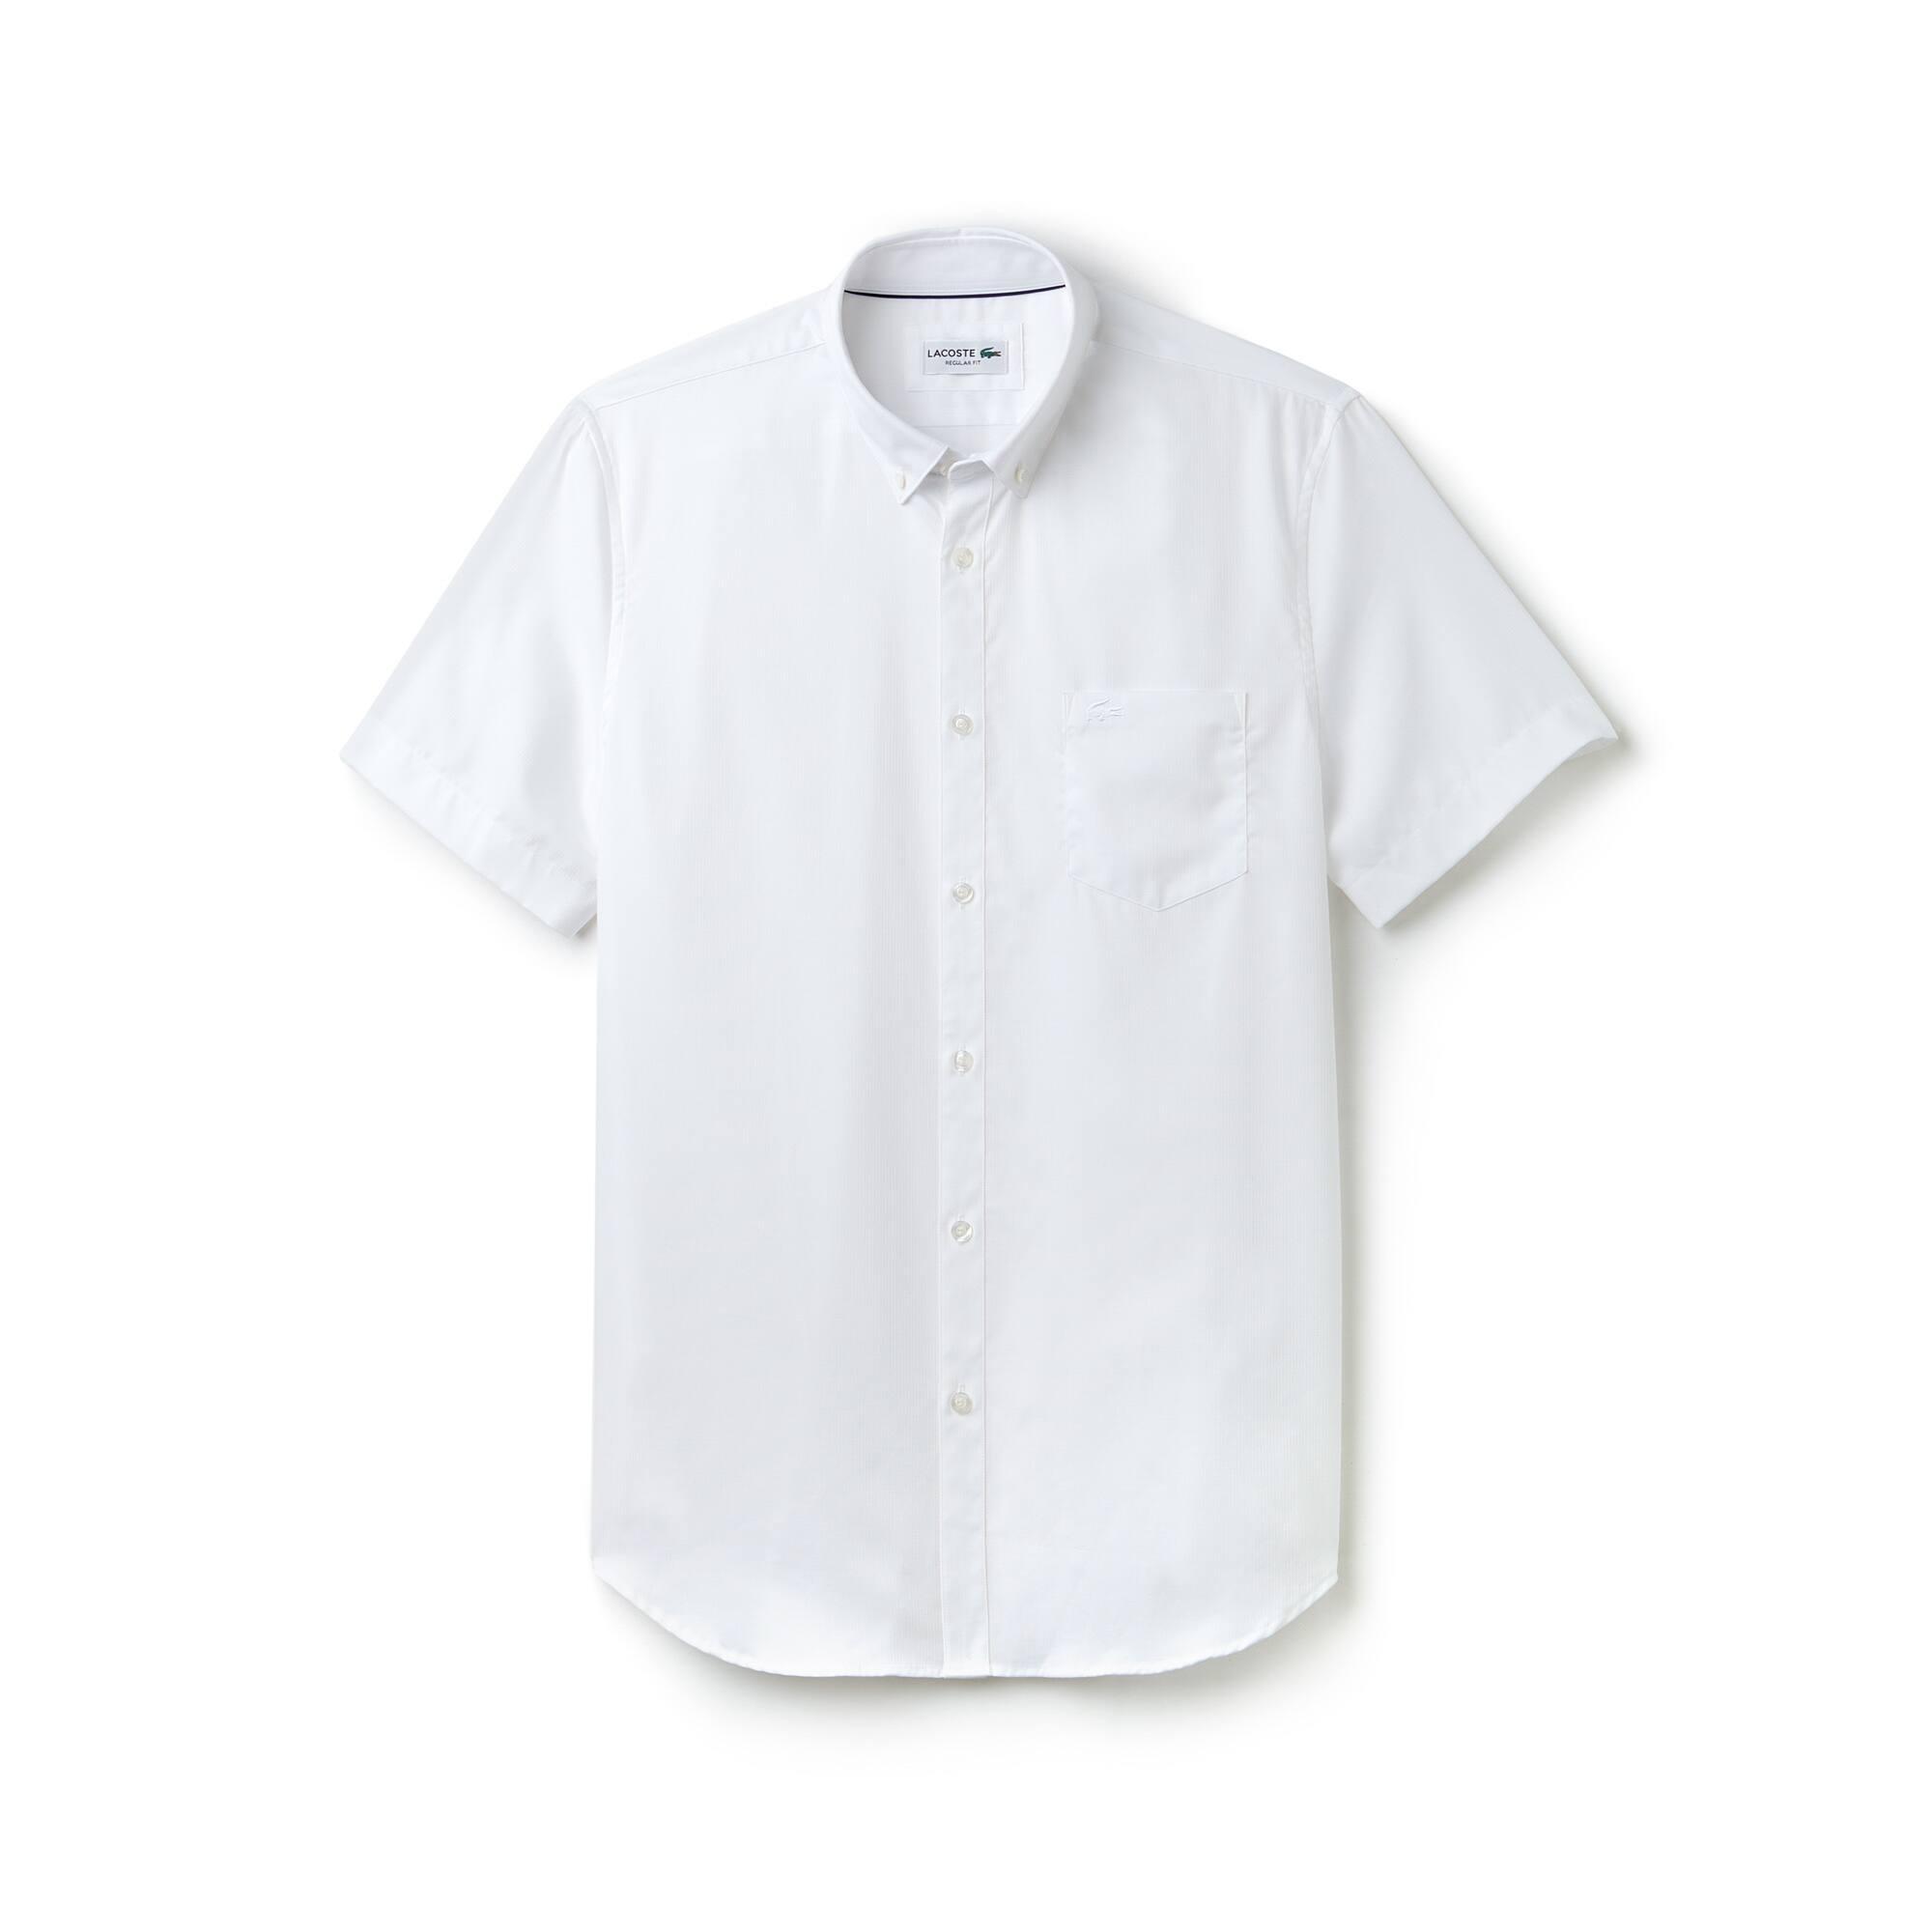 Regular Fit Herren-Hemd aus strukturierter Popeline